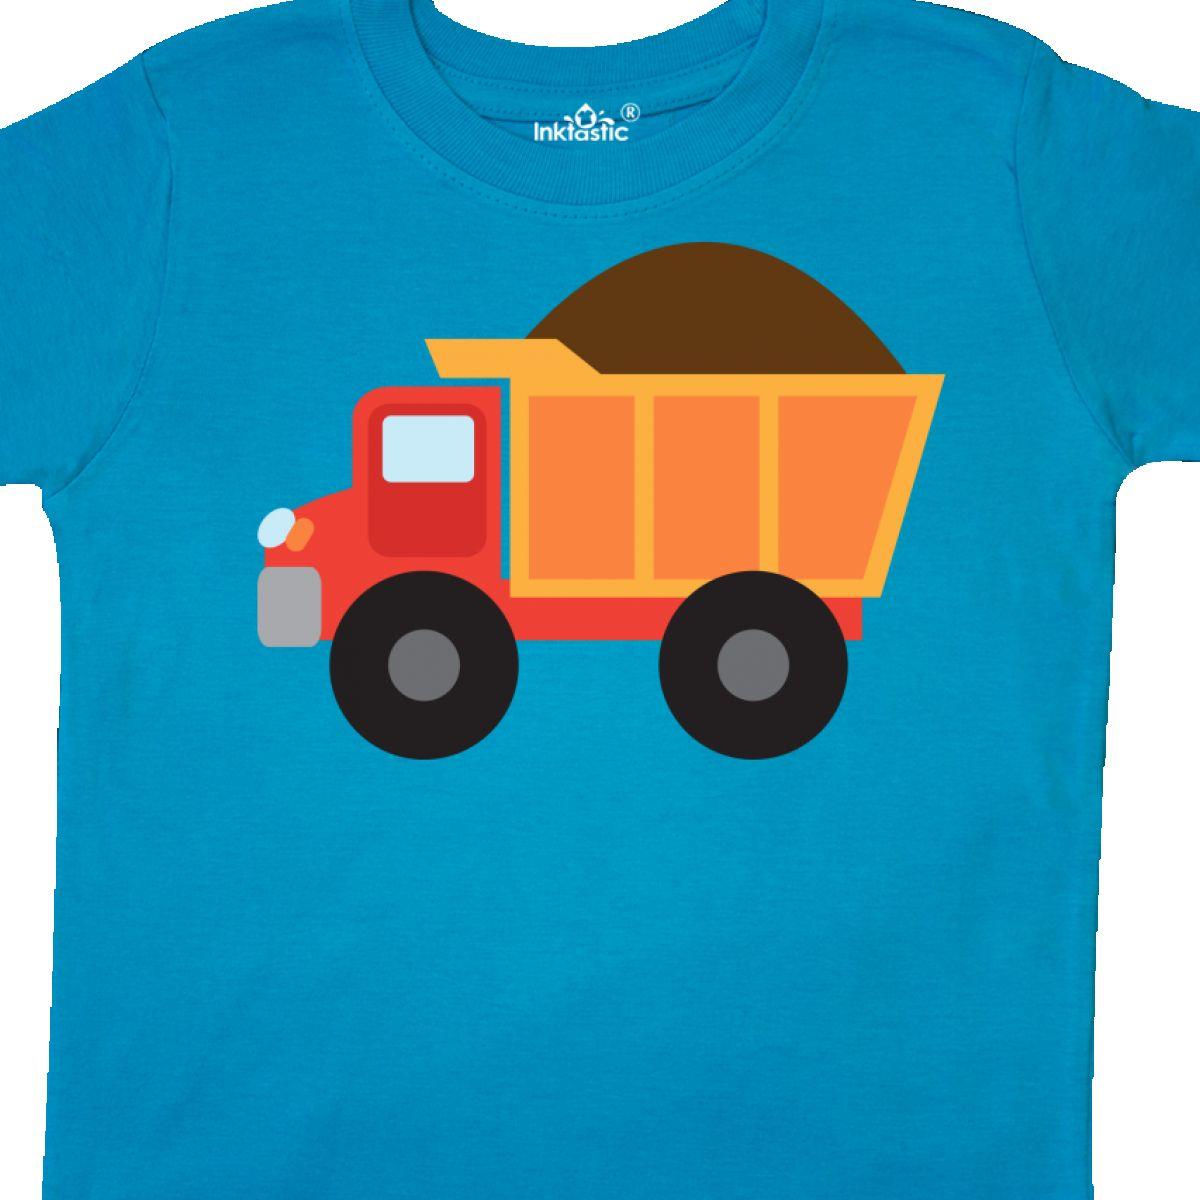 Inktastic-Work-Truck-Construction-Vehicle-Toddler-T-Shirt-Trucks-Vehicles-Cute thumbnail 36